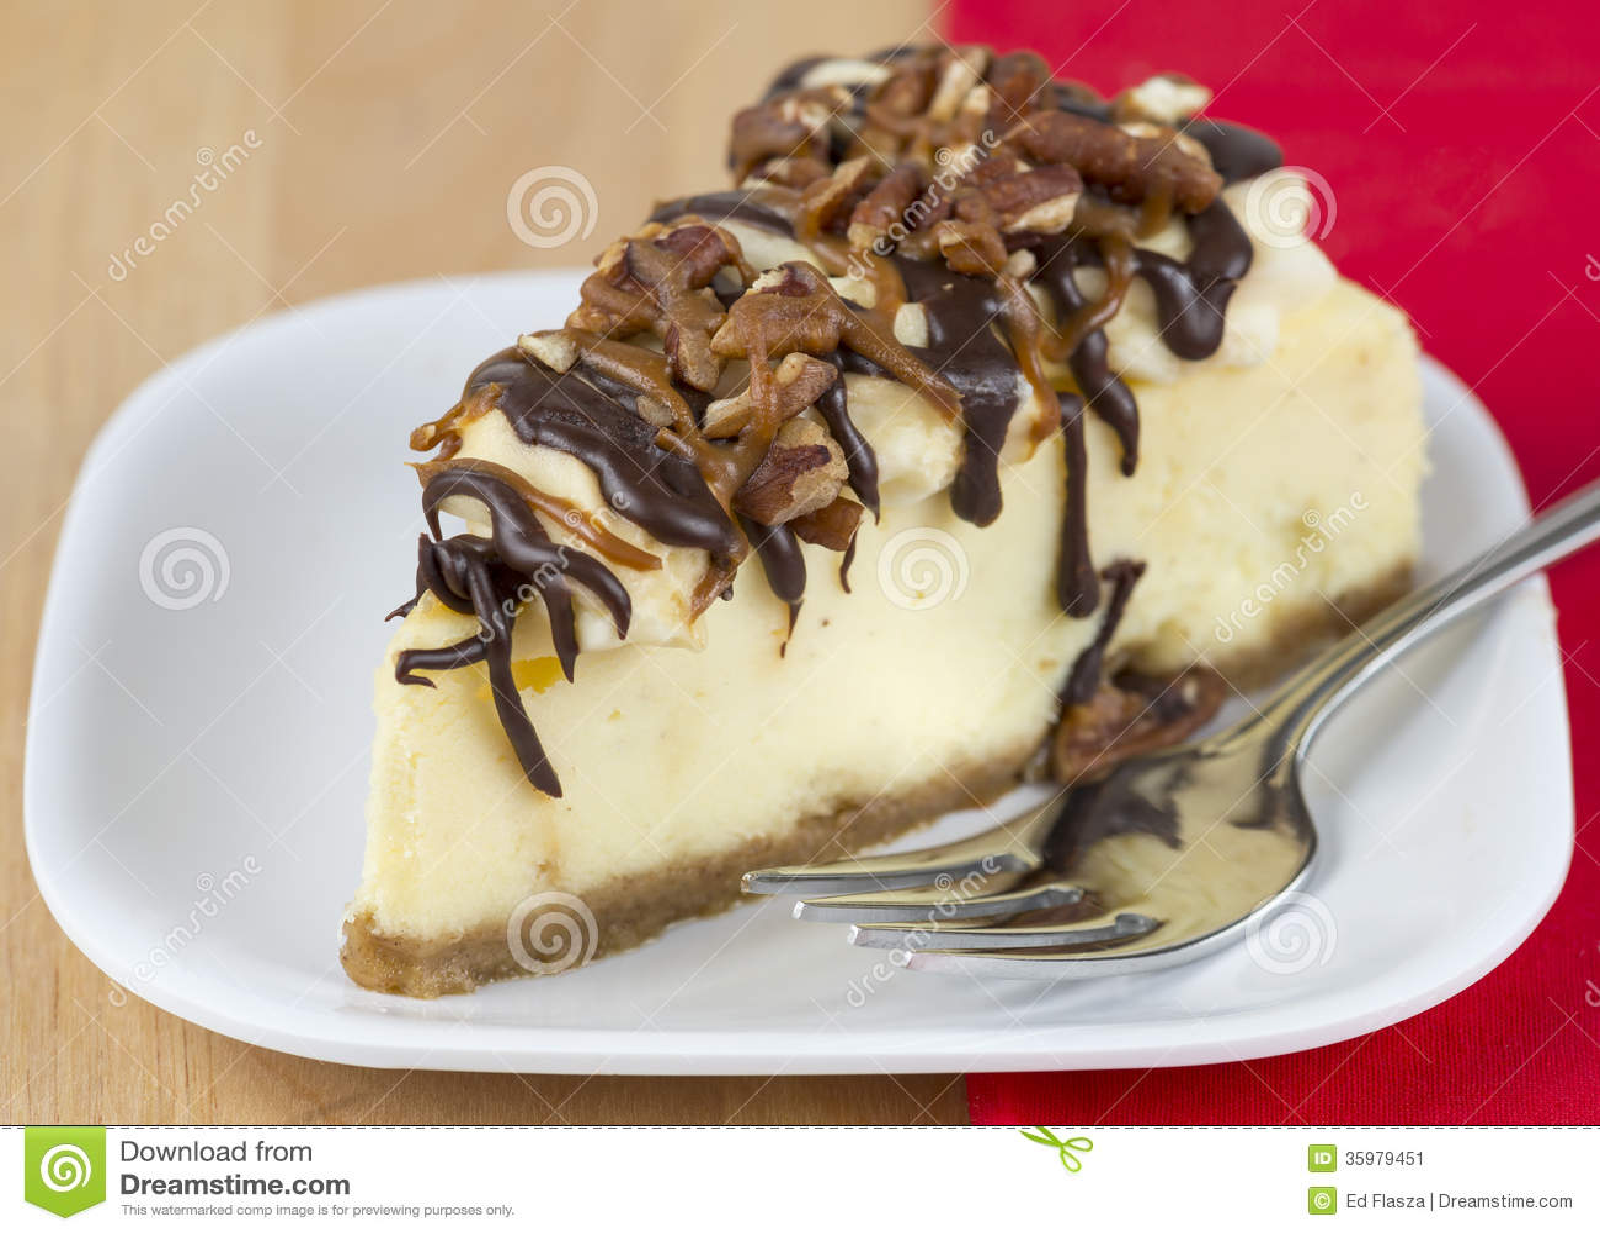 Turtle cheese cake stock image. Image of creamy, sweet ...